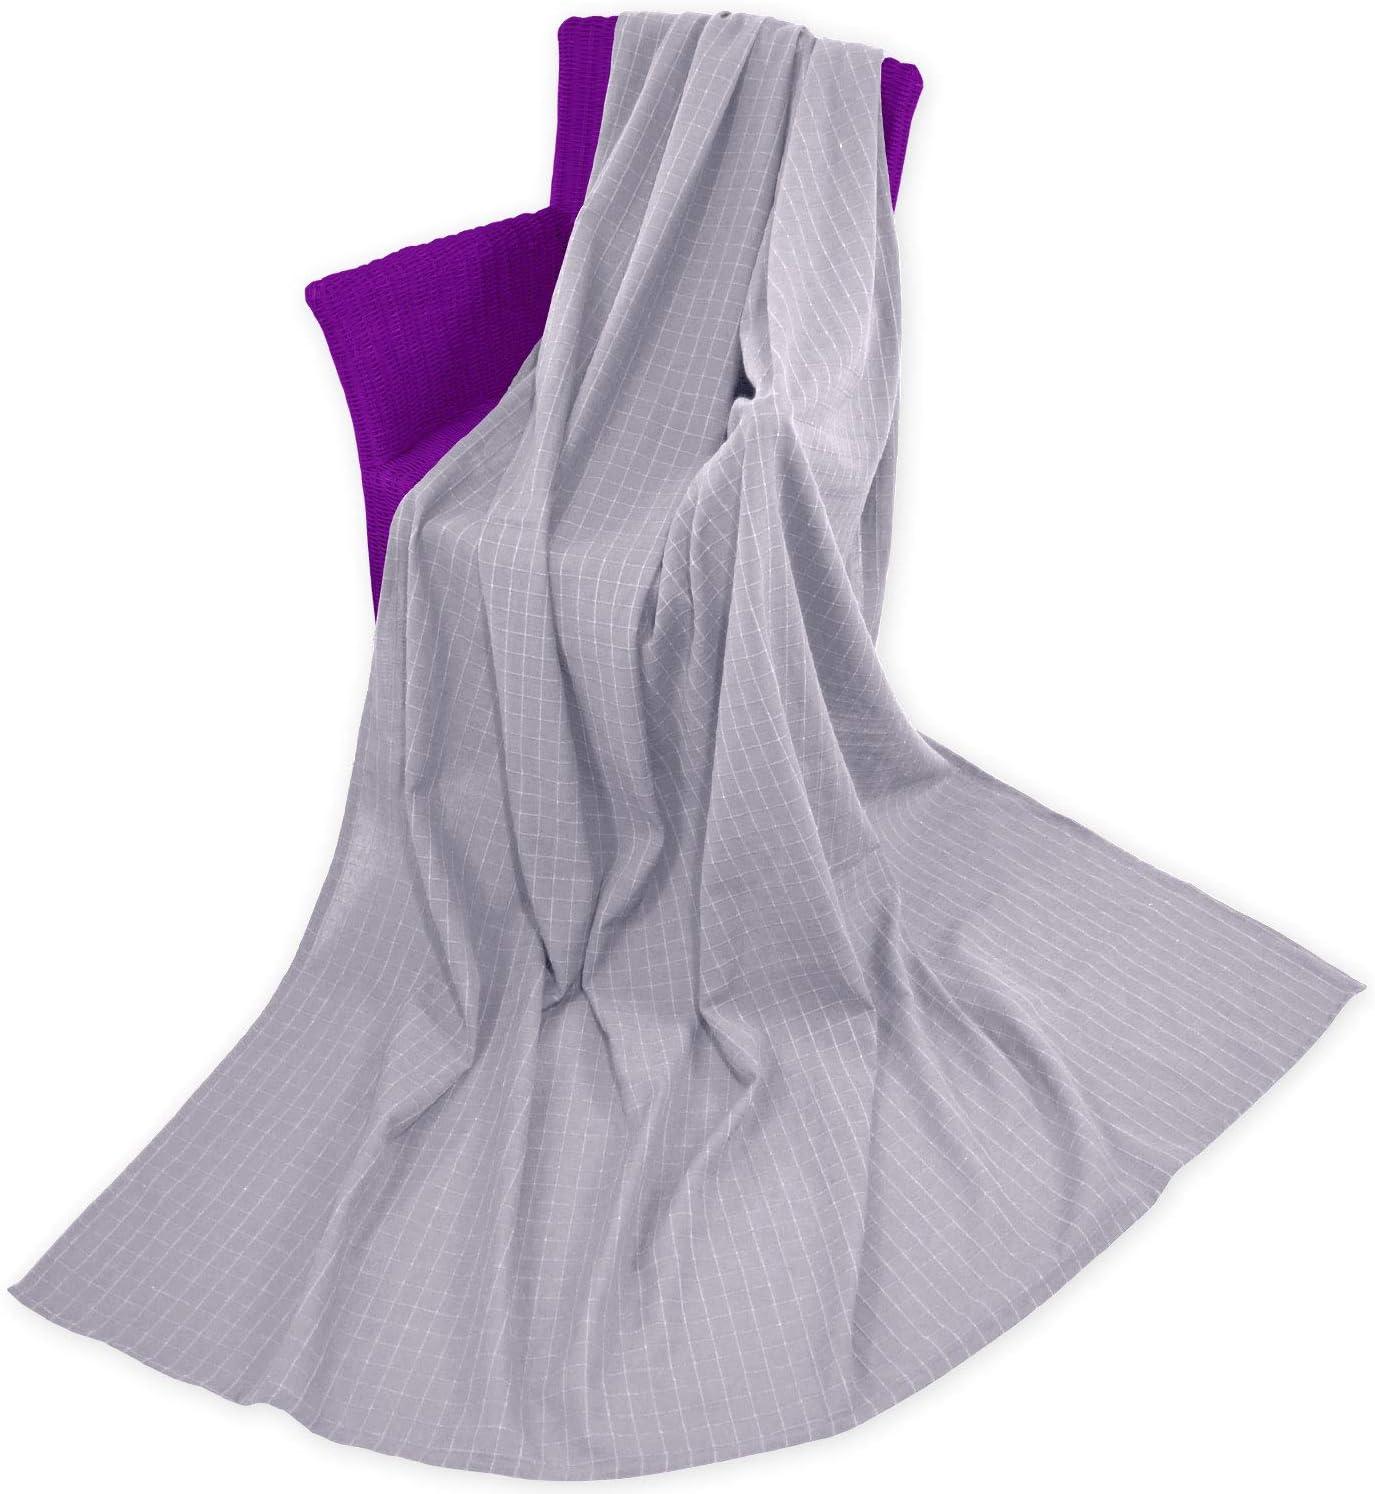 Qool24 Monika Sofa/überwurf 100/% Baumwolle /Überwurf Decke Sesselschoner Bett/überwurf Cappuccino 220 x 150 cm